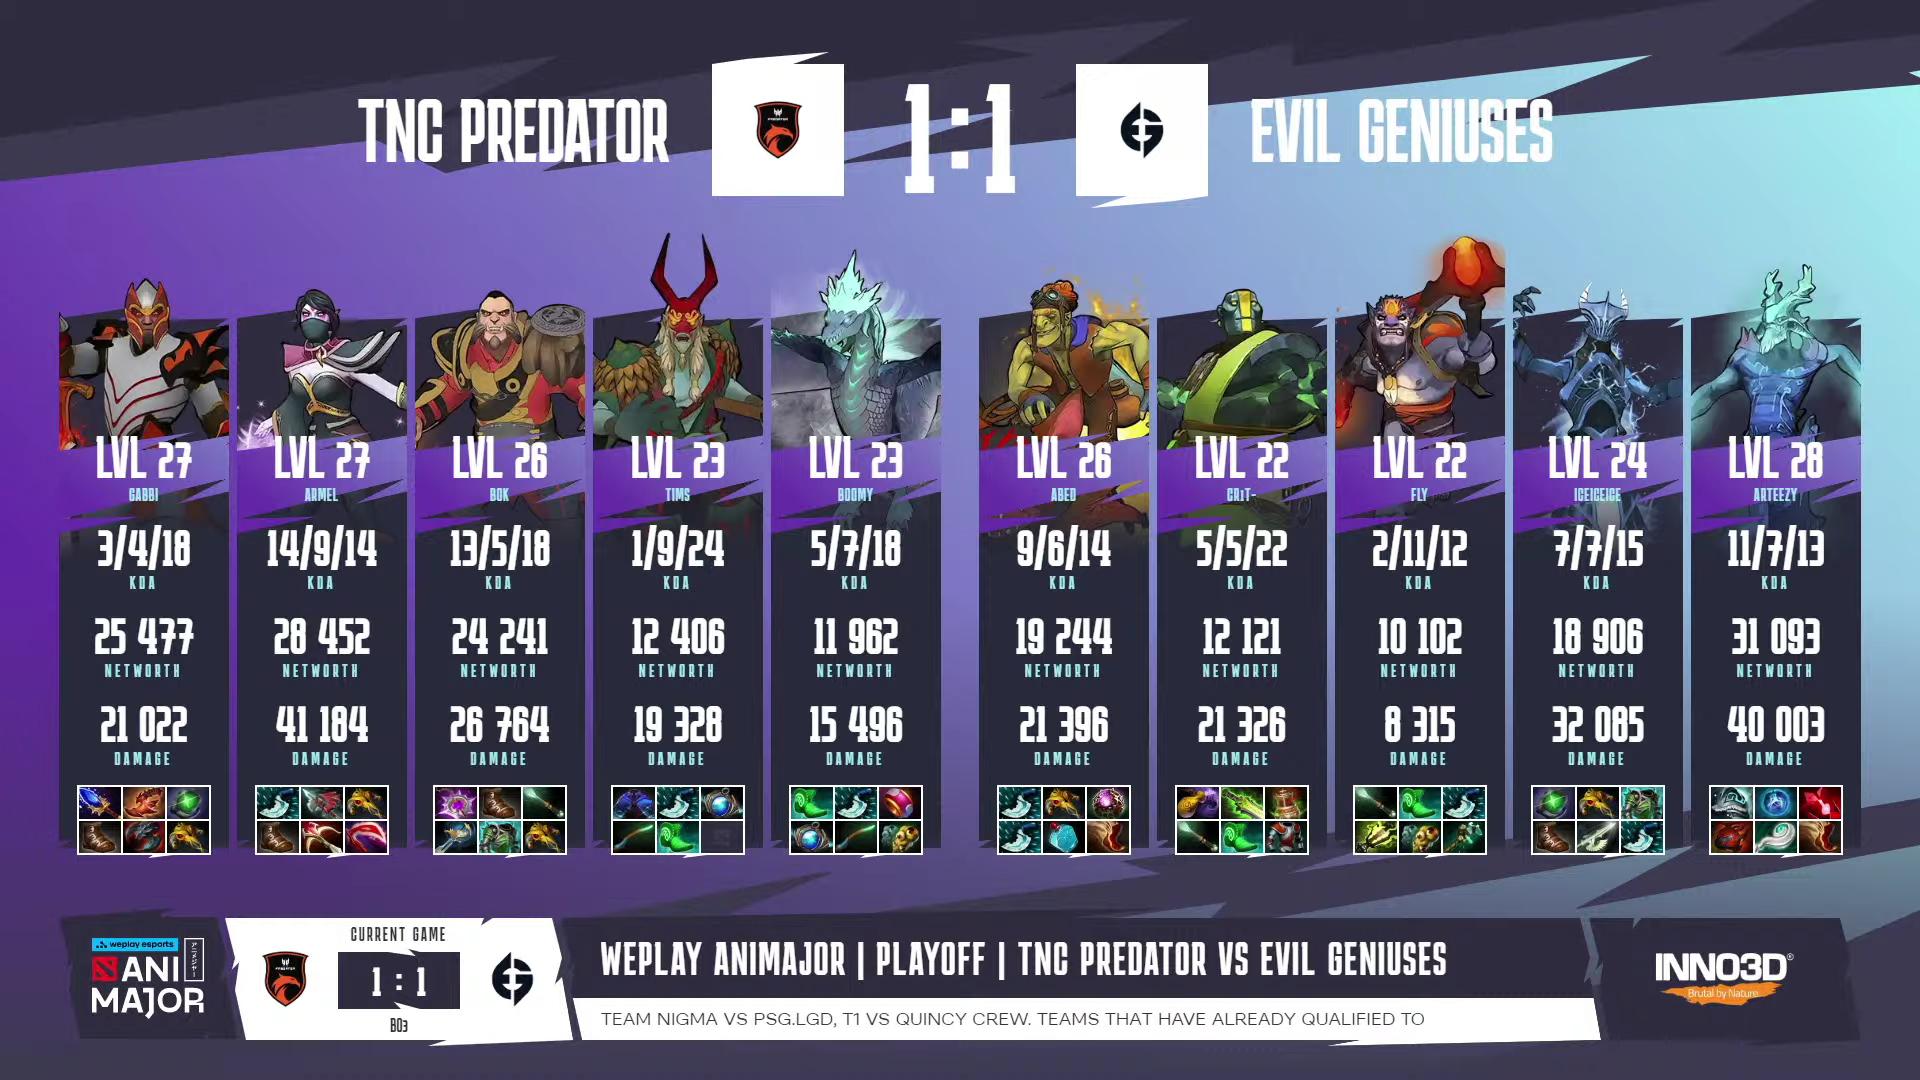 2021-AniMajor-Evil-Geniuses-def-TNC-Game-2 Abed knocks out TNC's AniMajor hopes DOTA 2 ESports News  - philippine sports news